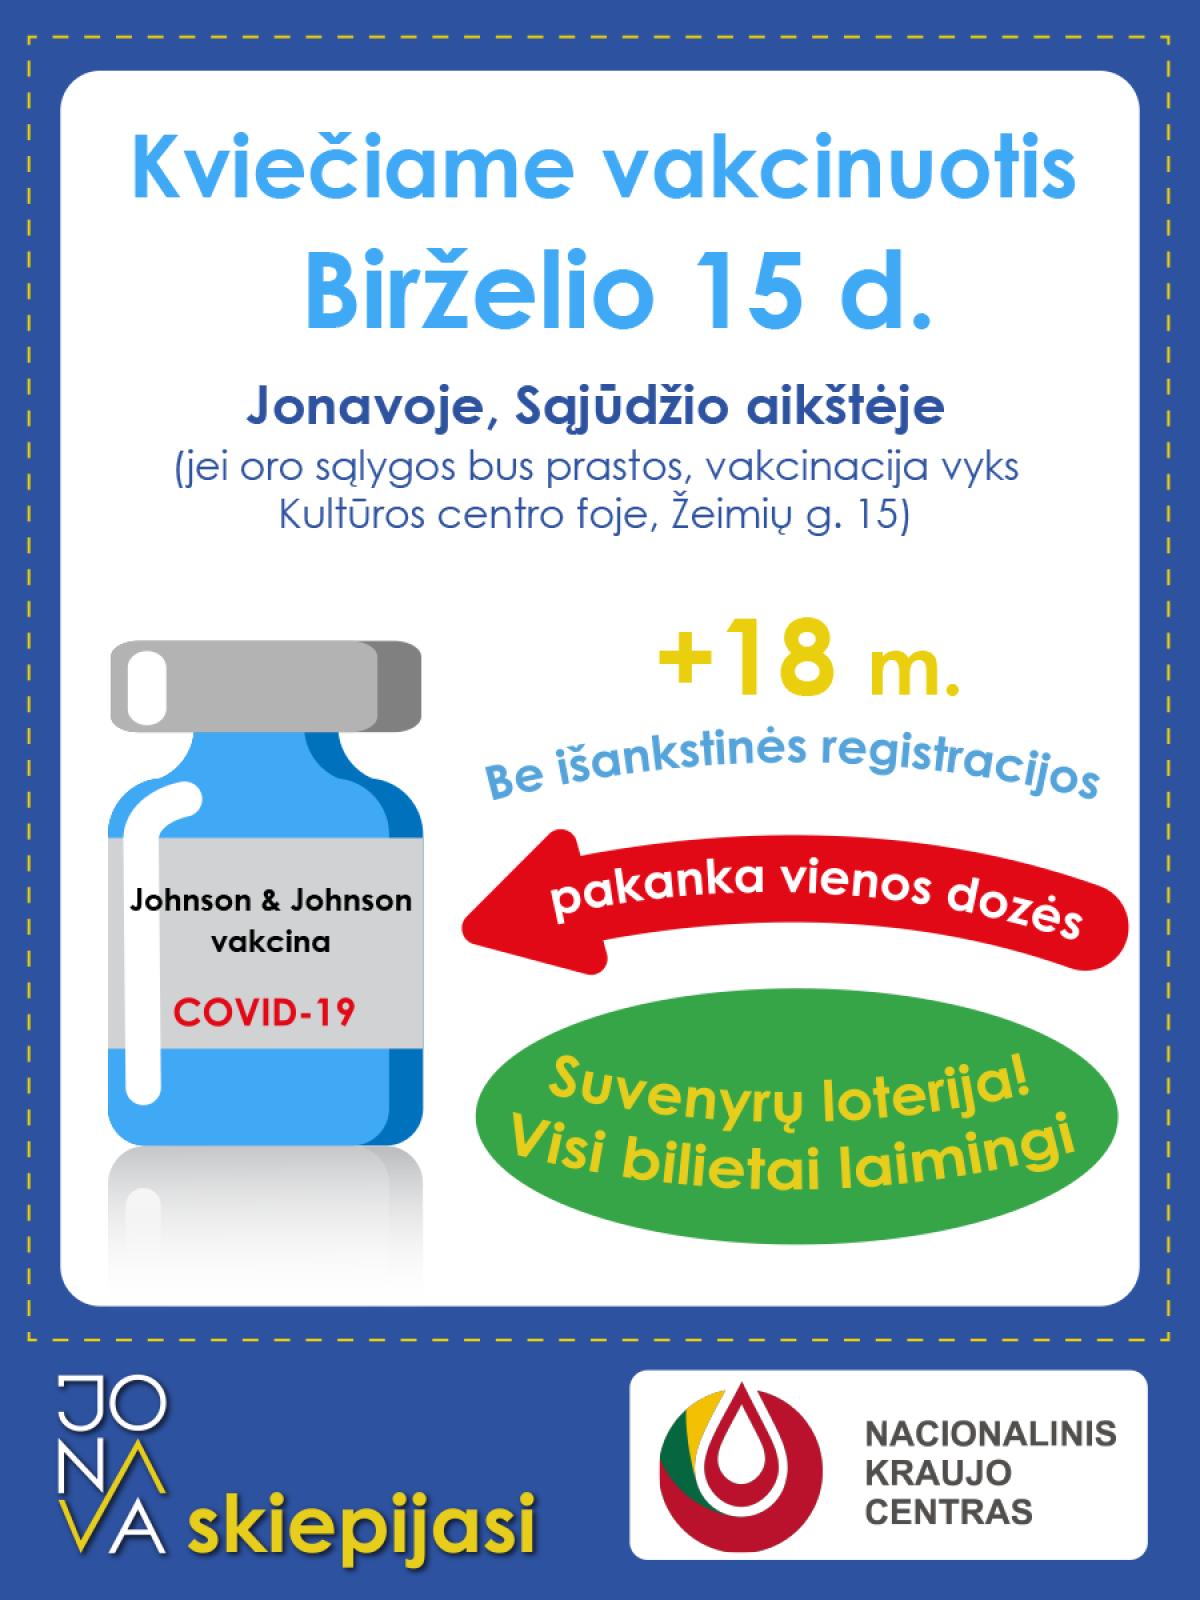 Vakcinavimo akcija Jonavoje